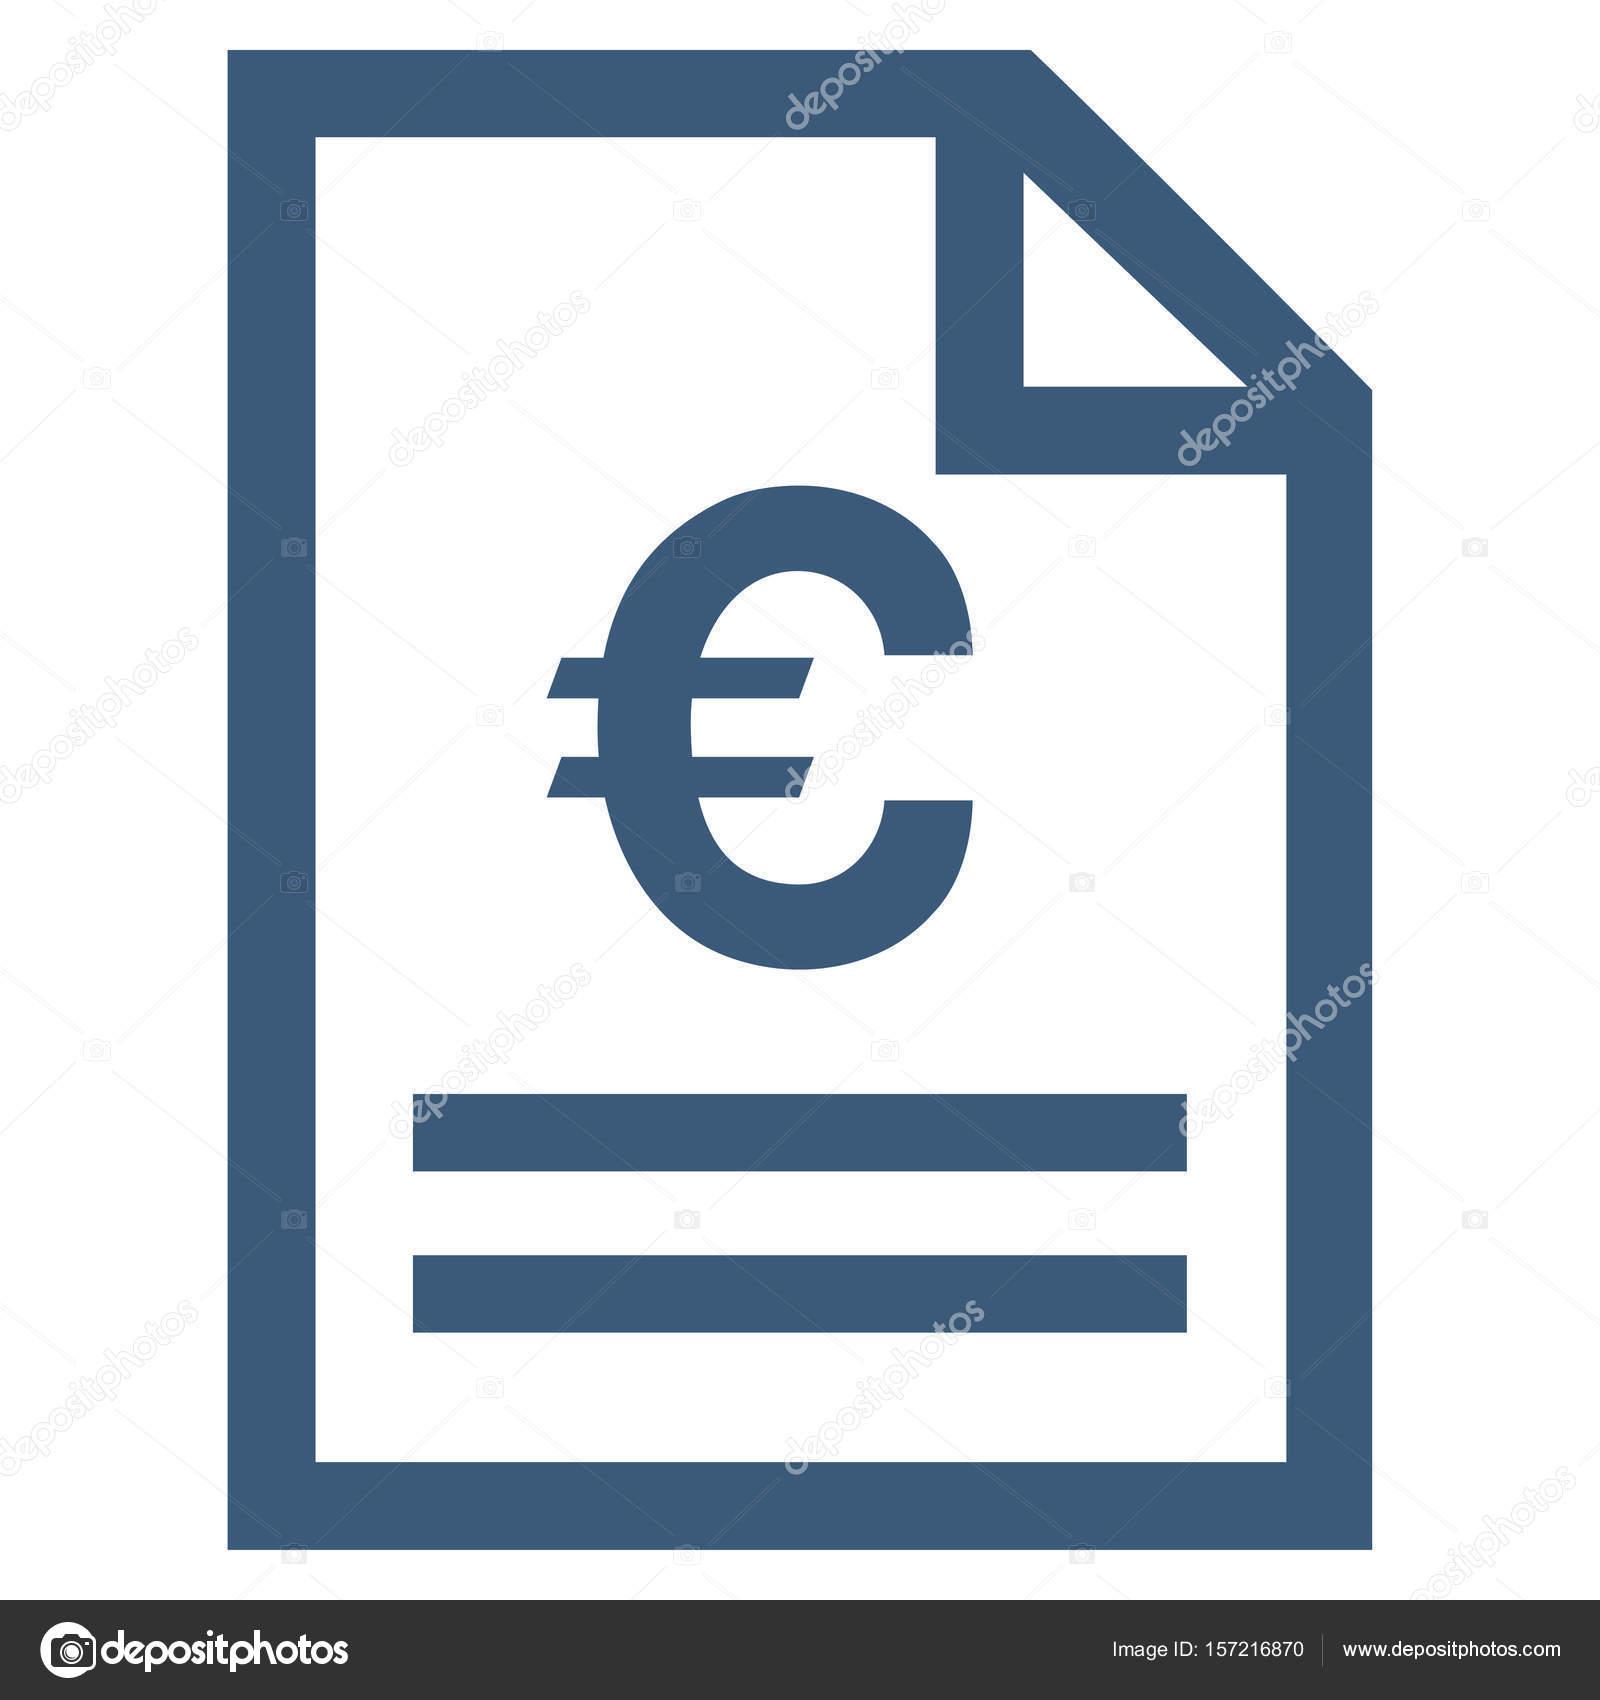 euro rechnung seite flach vektor icon stockvektor. Black Bedroom Furniture Sets. Home Design Ideas